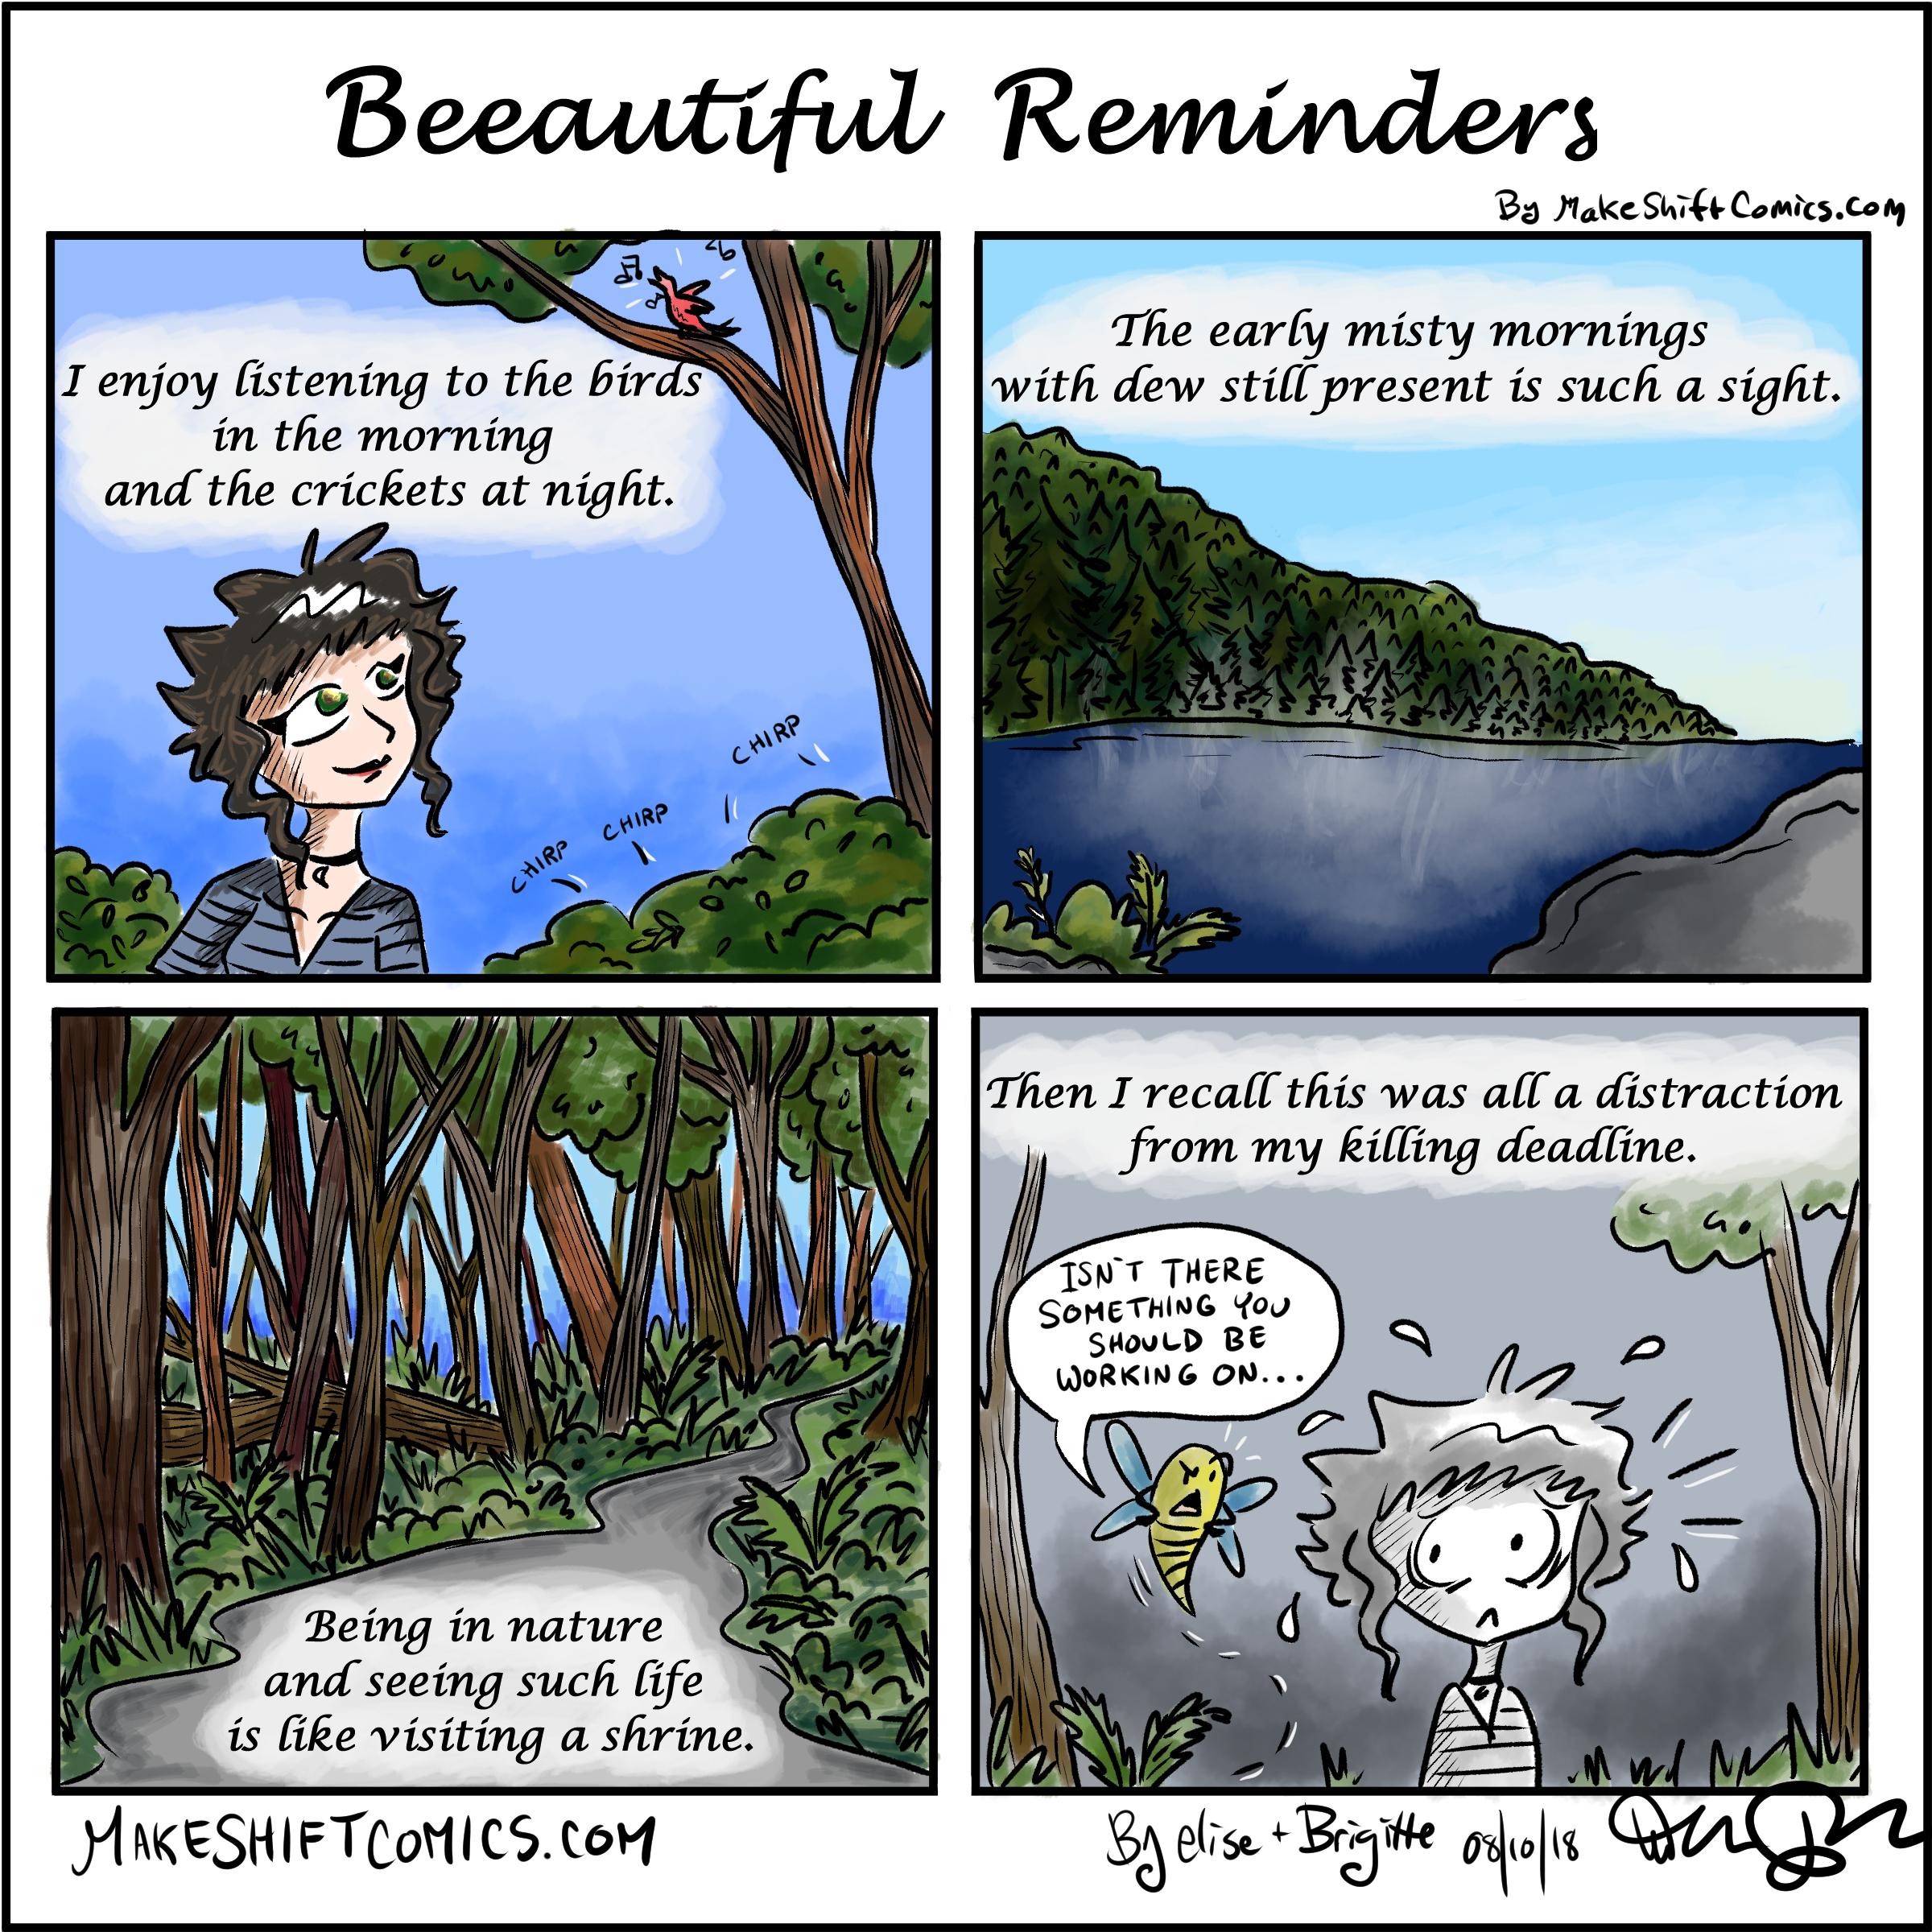 Beeautiful Reminders